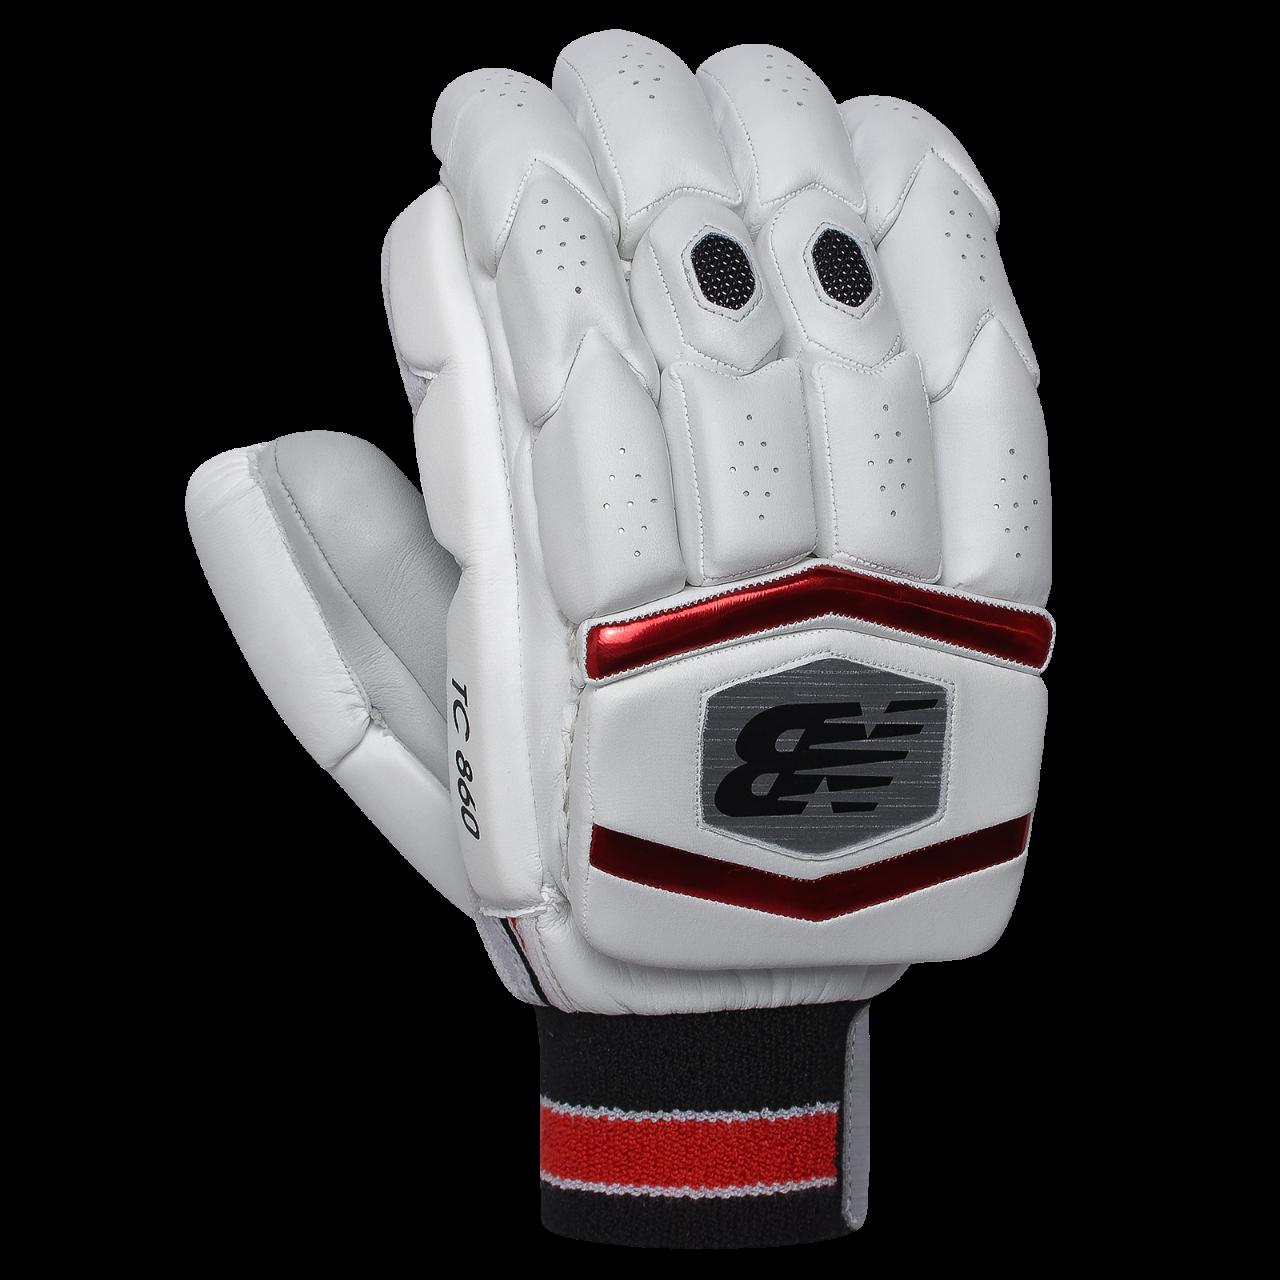 2021 New Balance TC 860 Batting Gloves